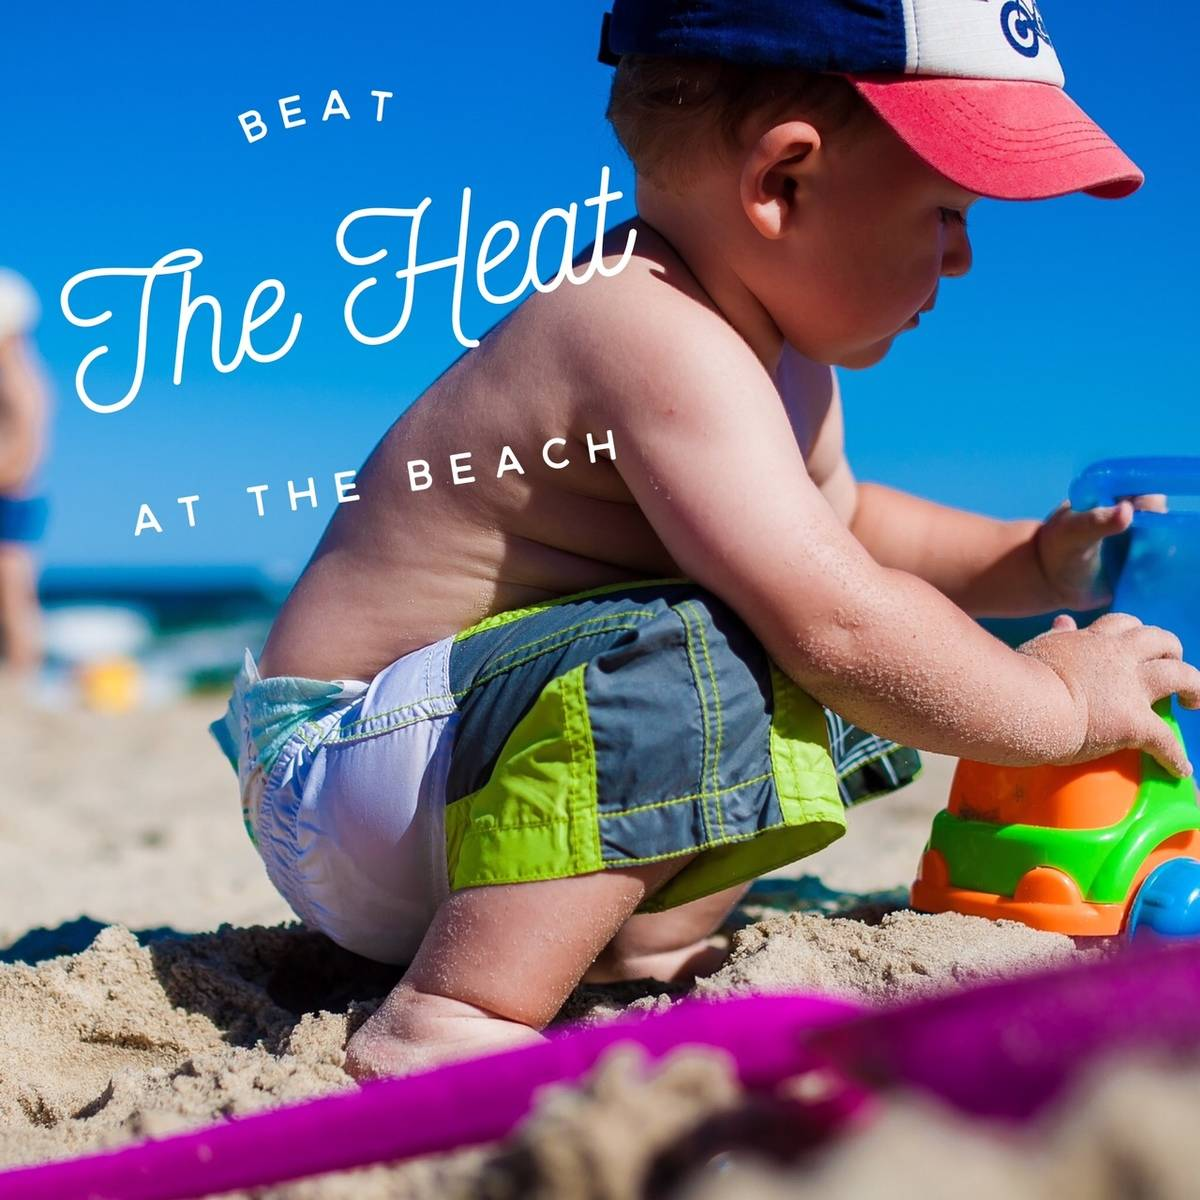 Kaye Swain Roseville real estate agent shares beach joys swimming pool tips more